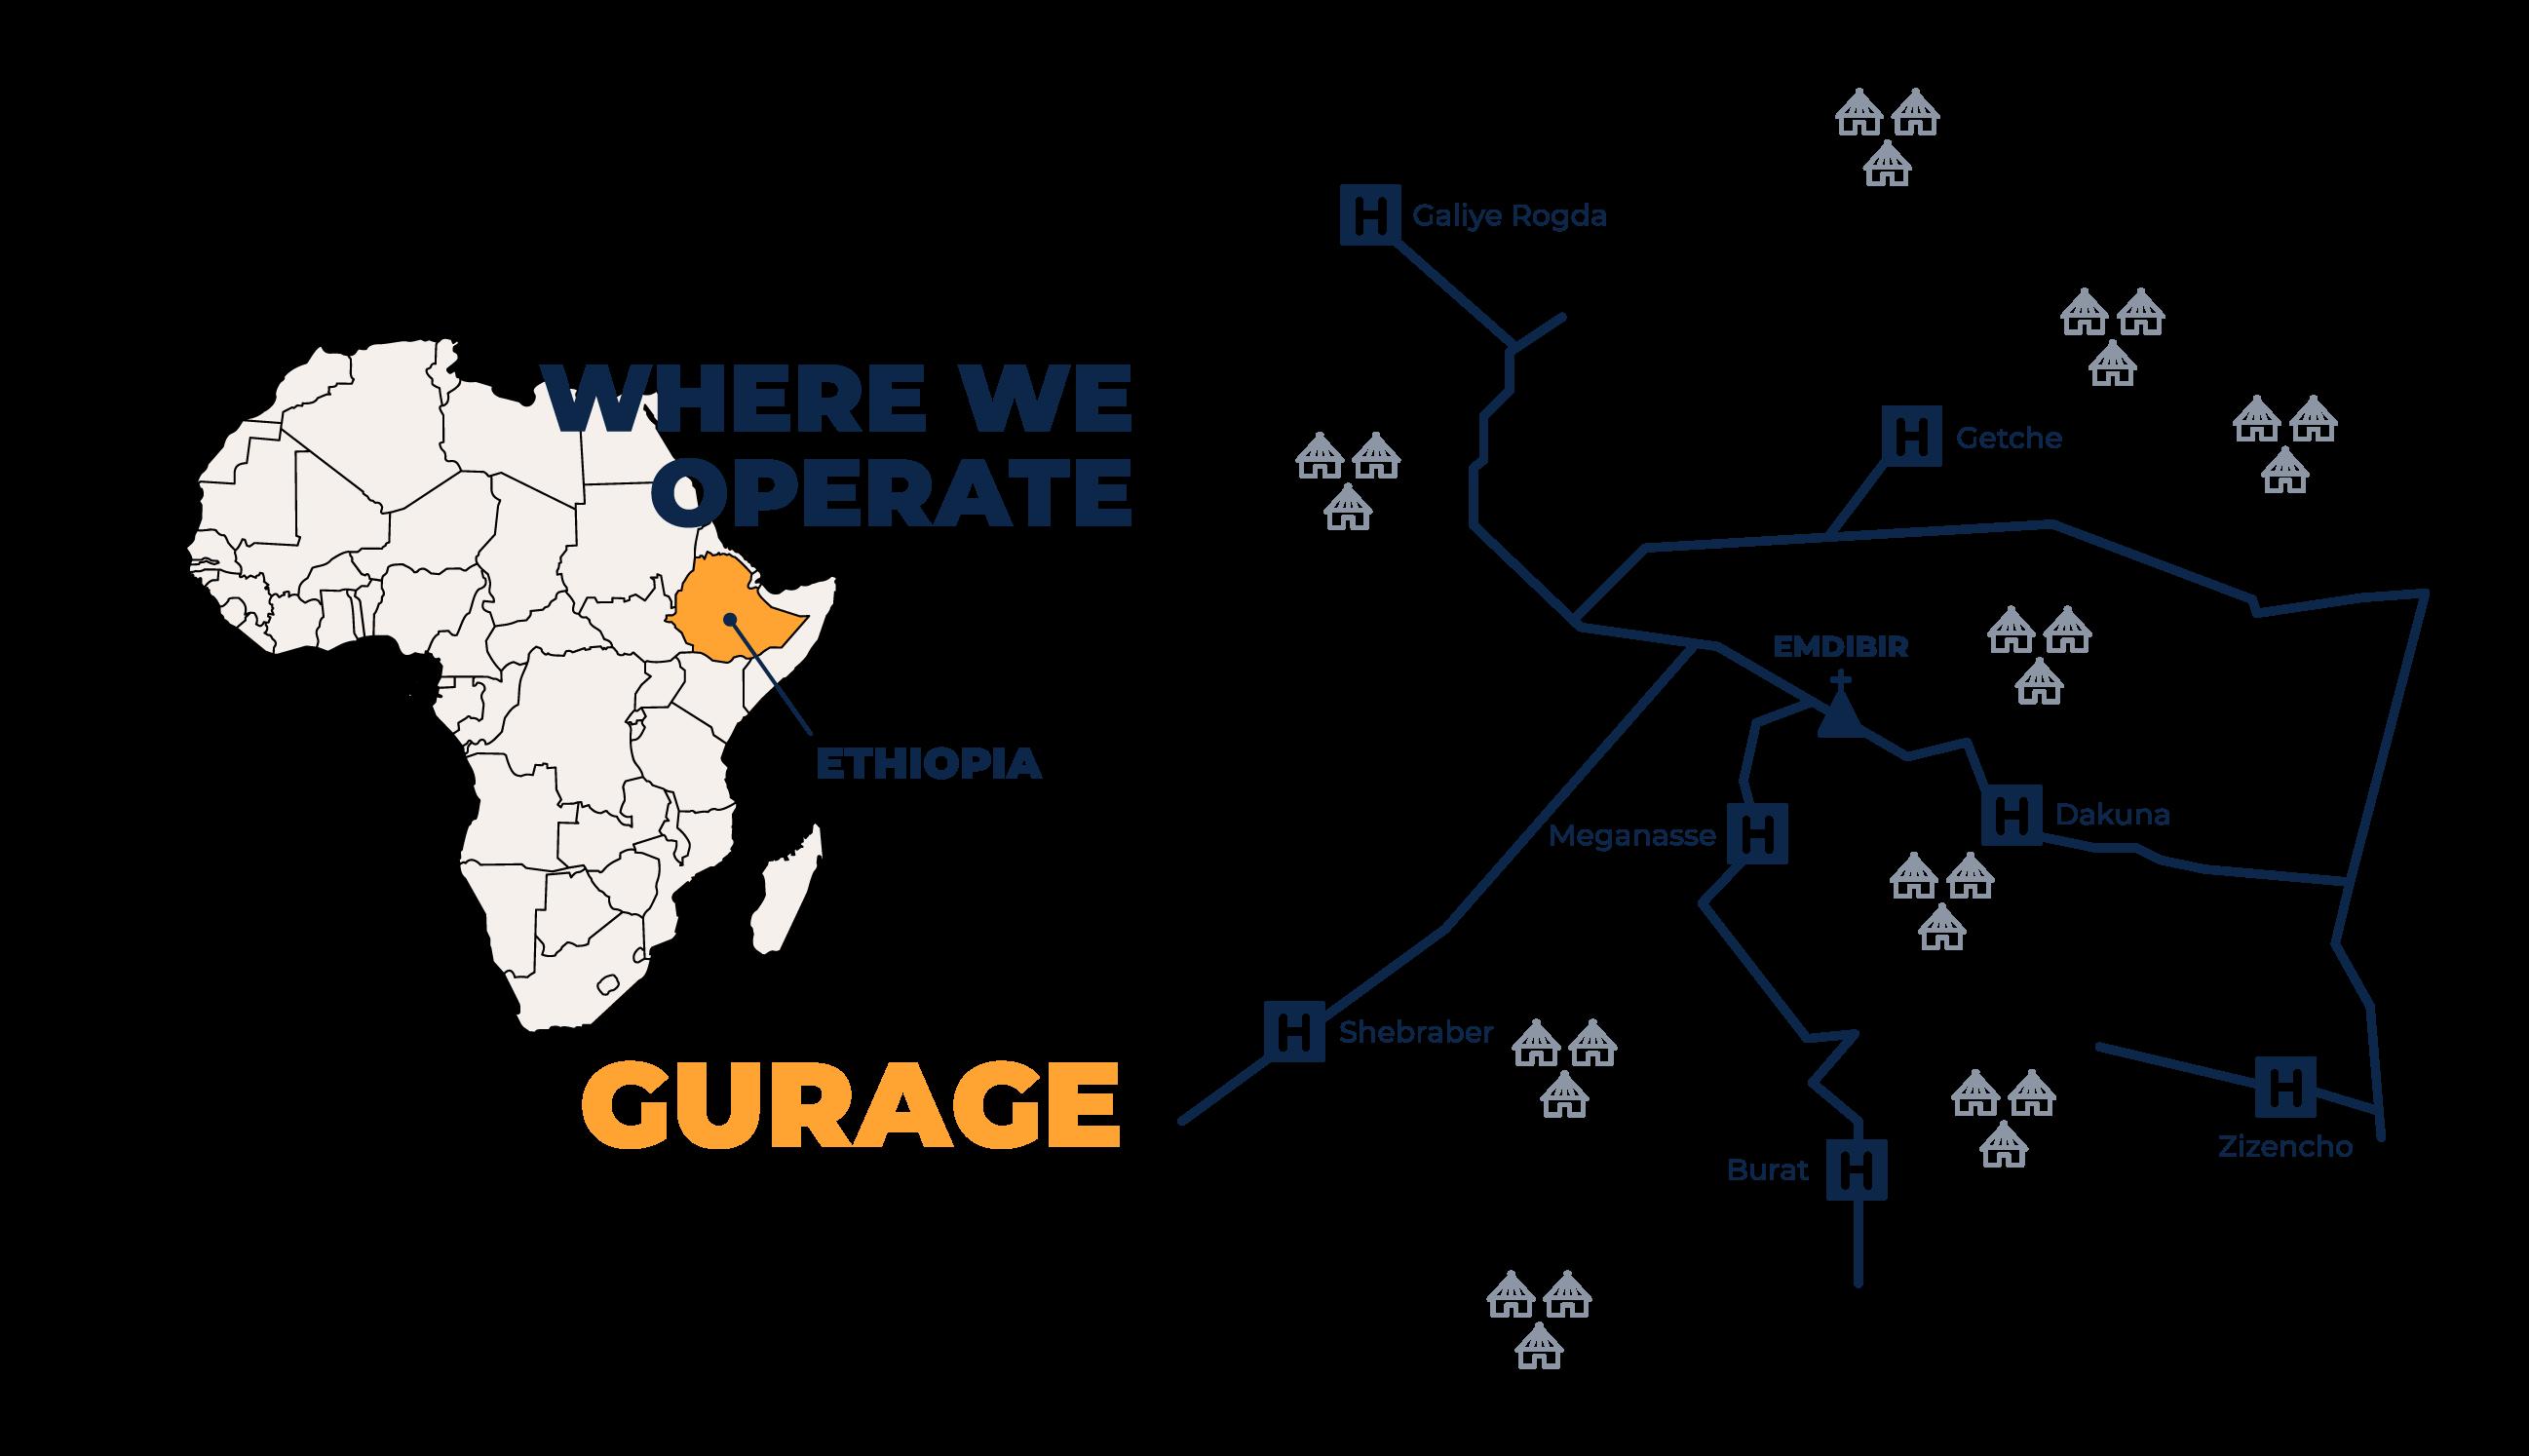 Gurage map